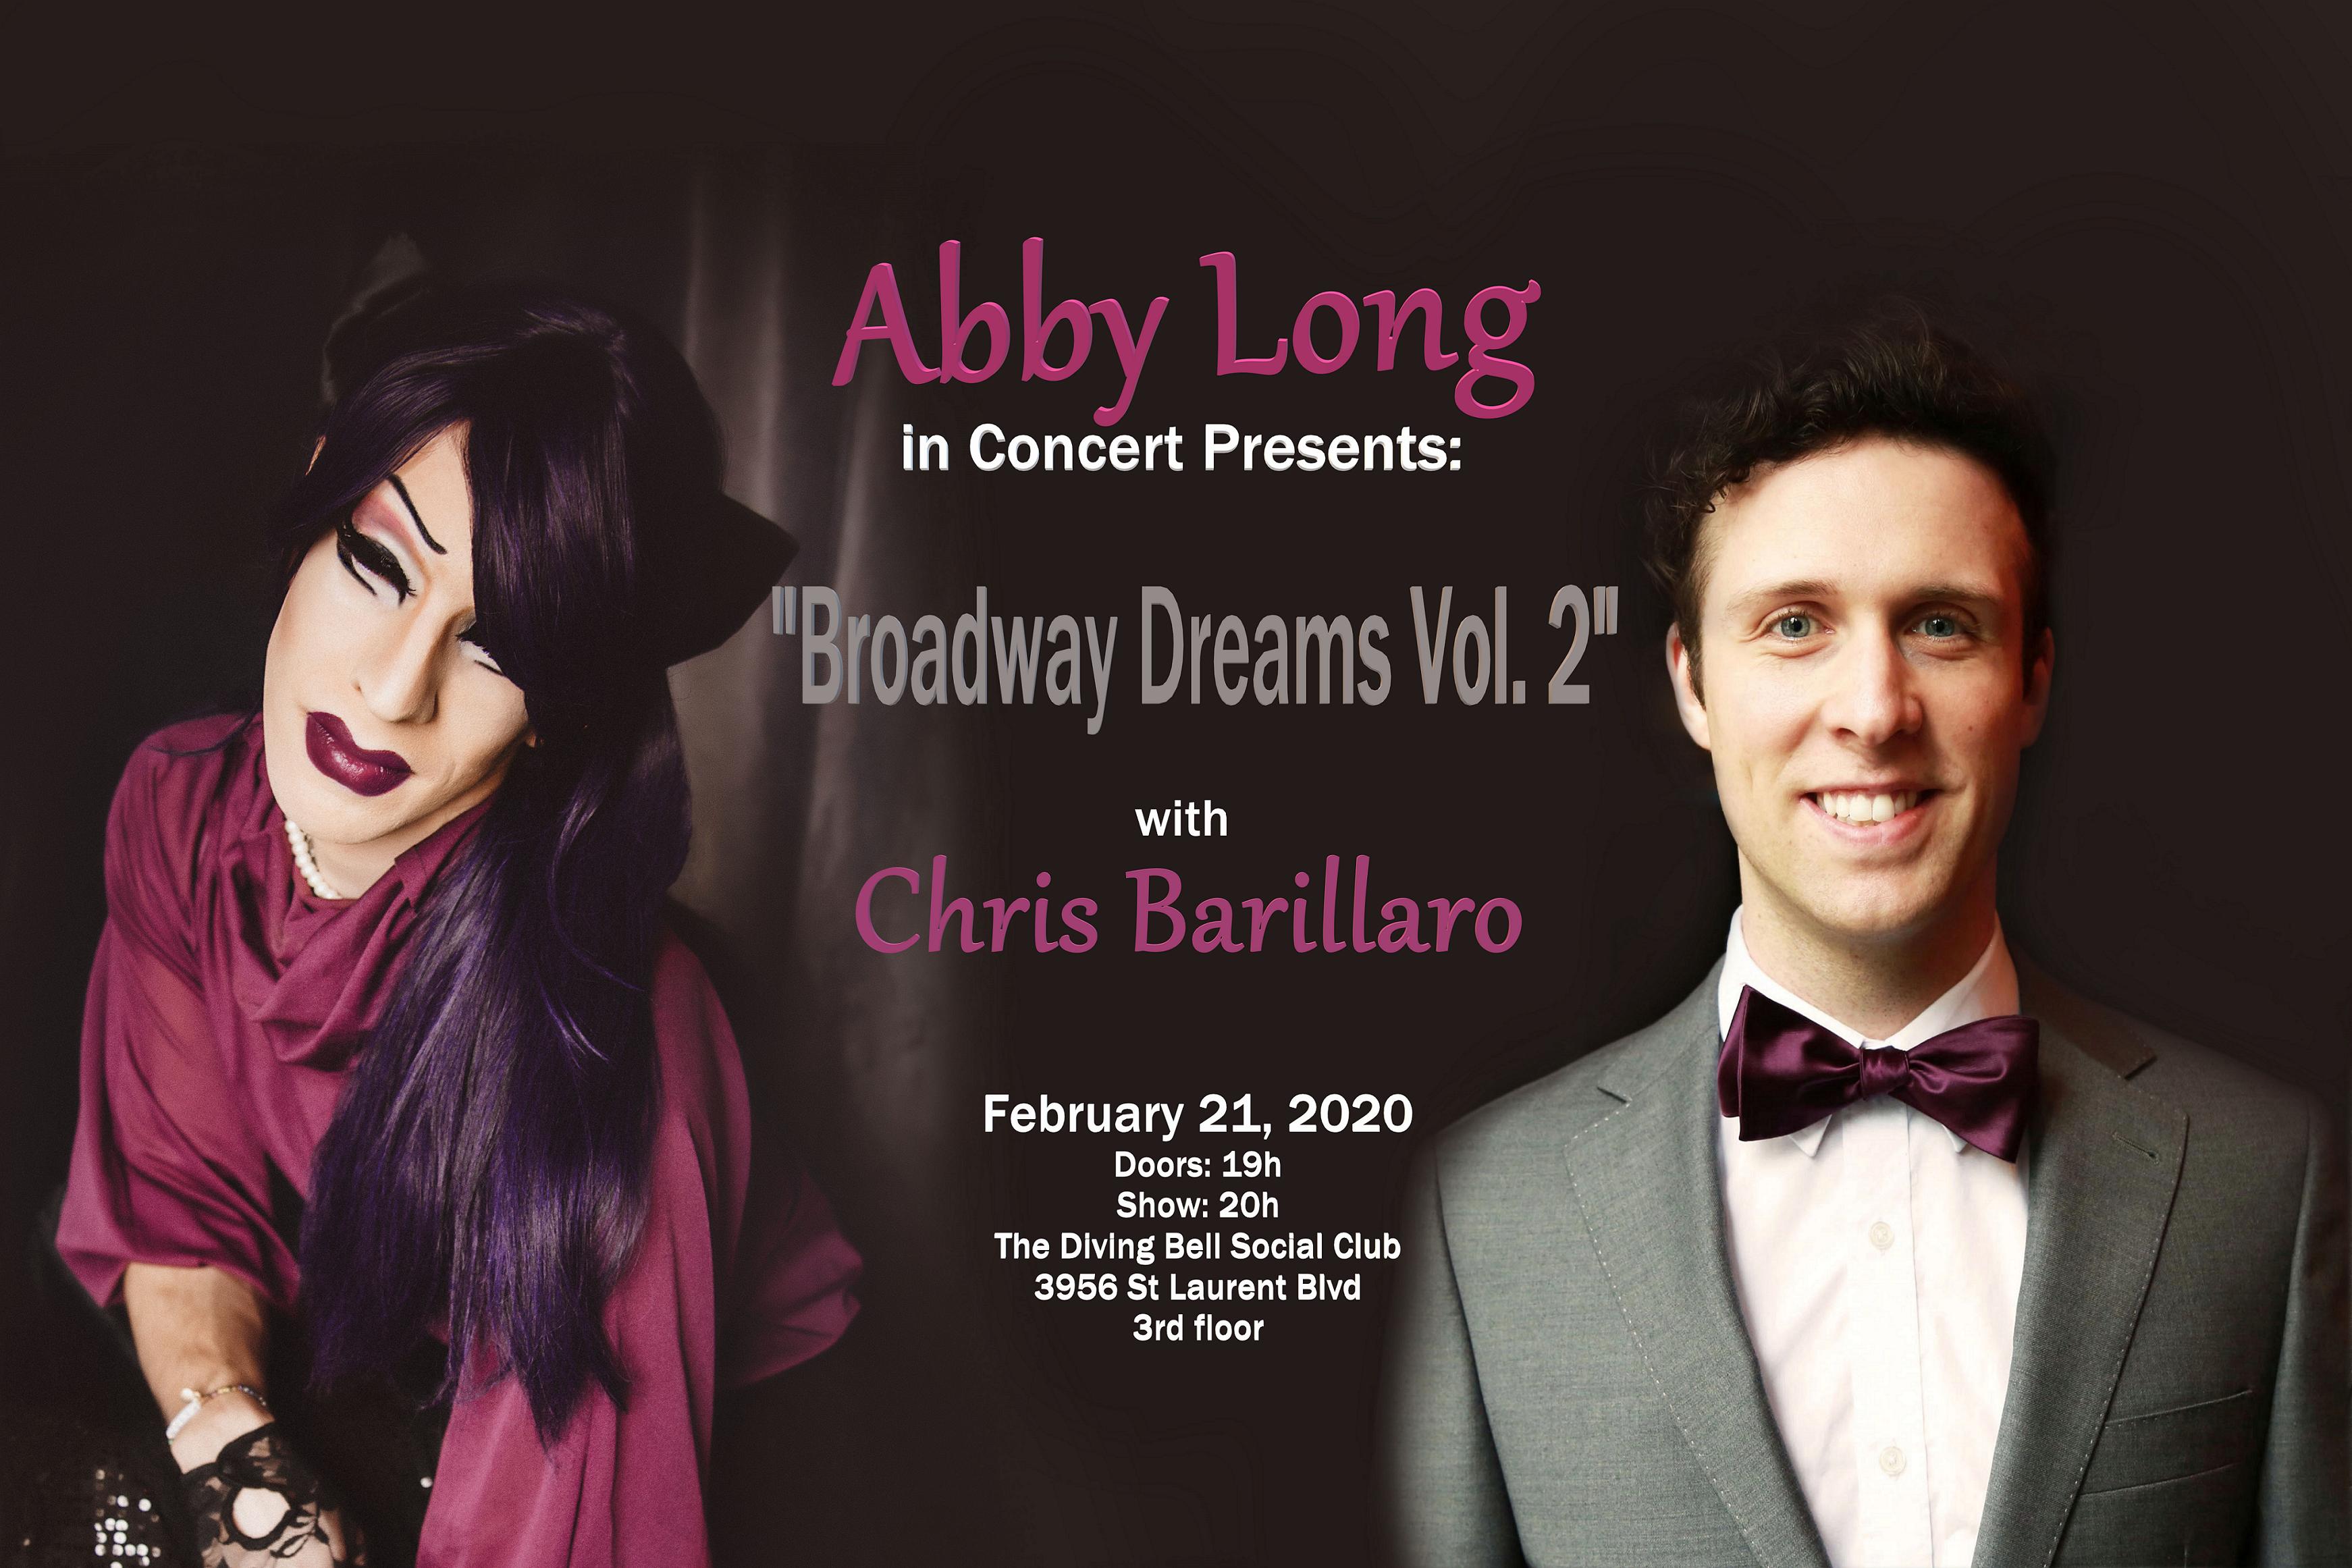 Broadway Dreams Vol. 2